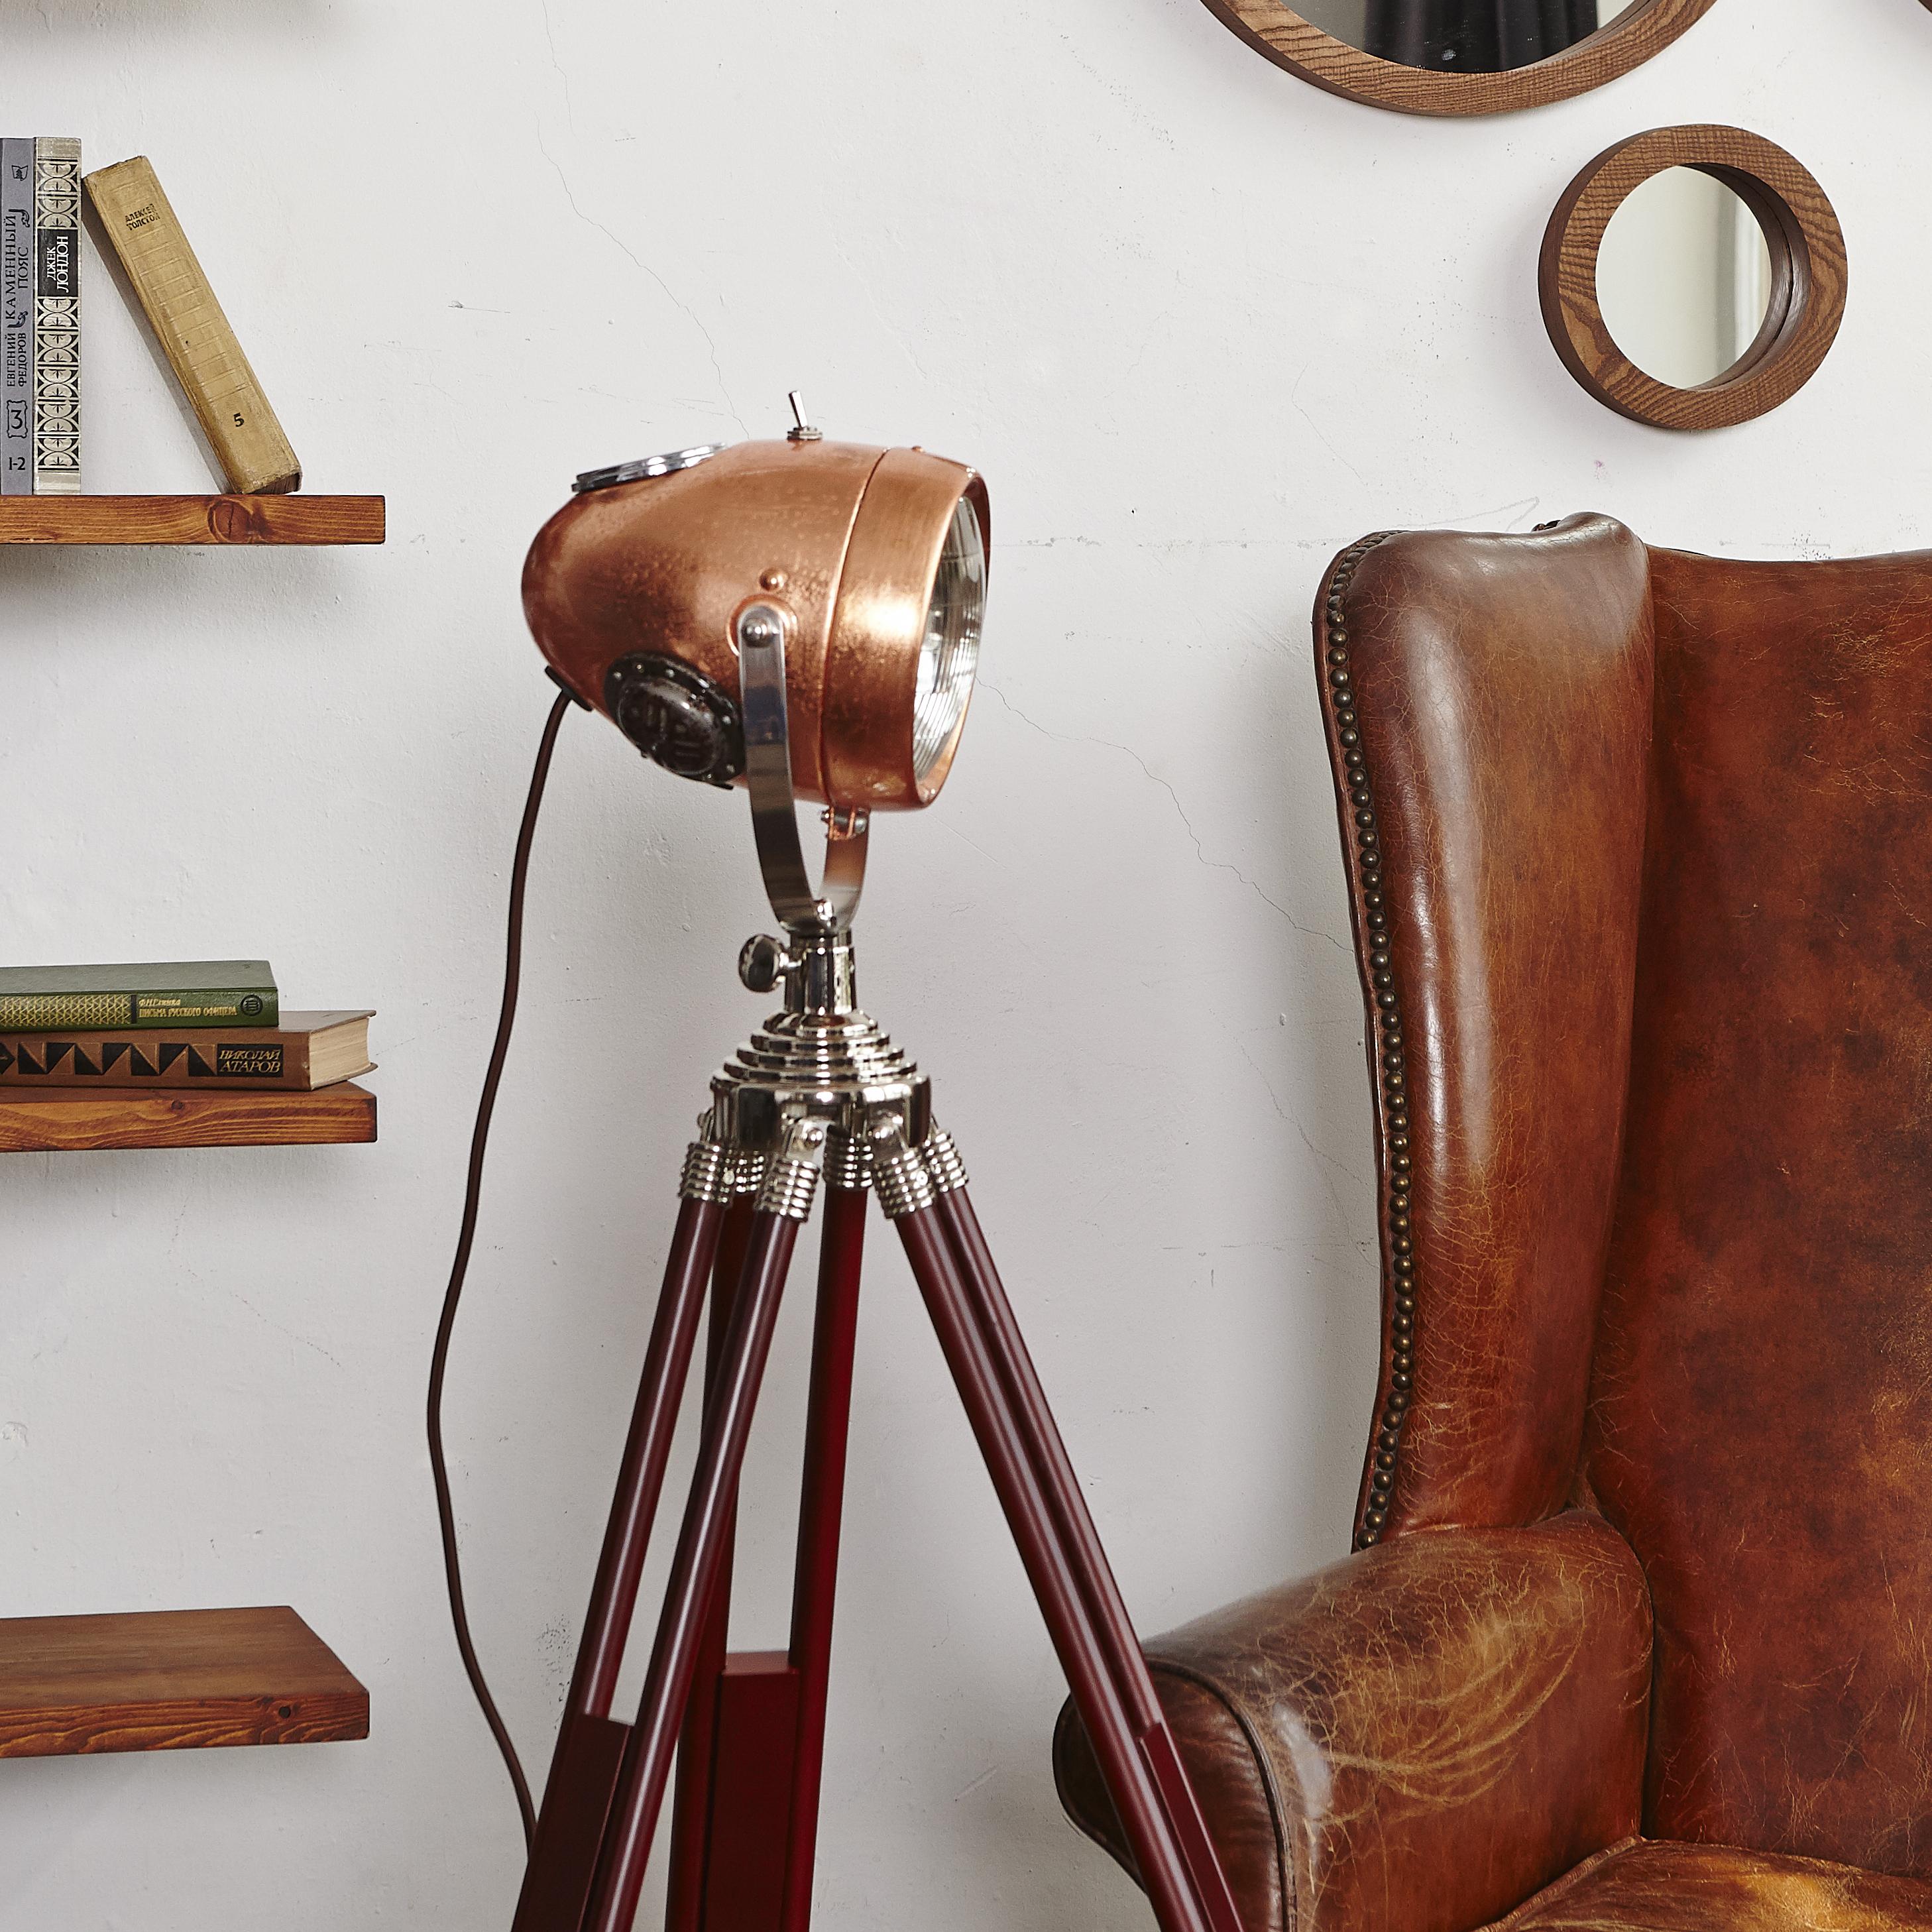 Купить Мото-торшер Vstileretro Roadmaster Copper, inmyroom, Россия